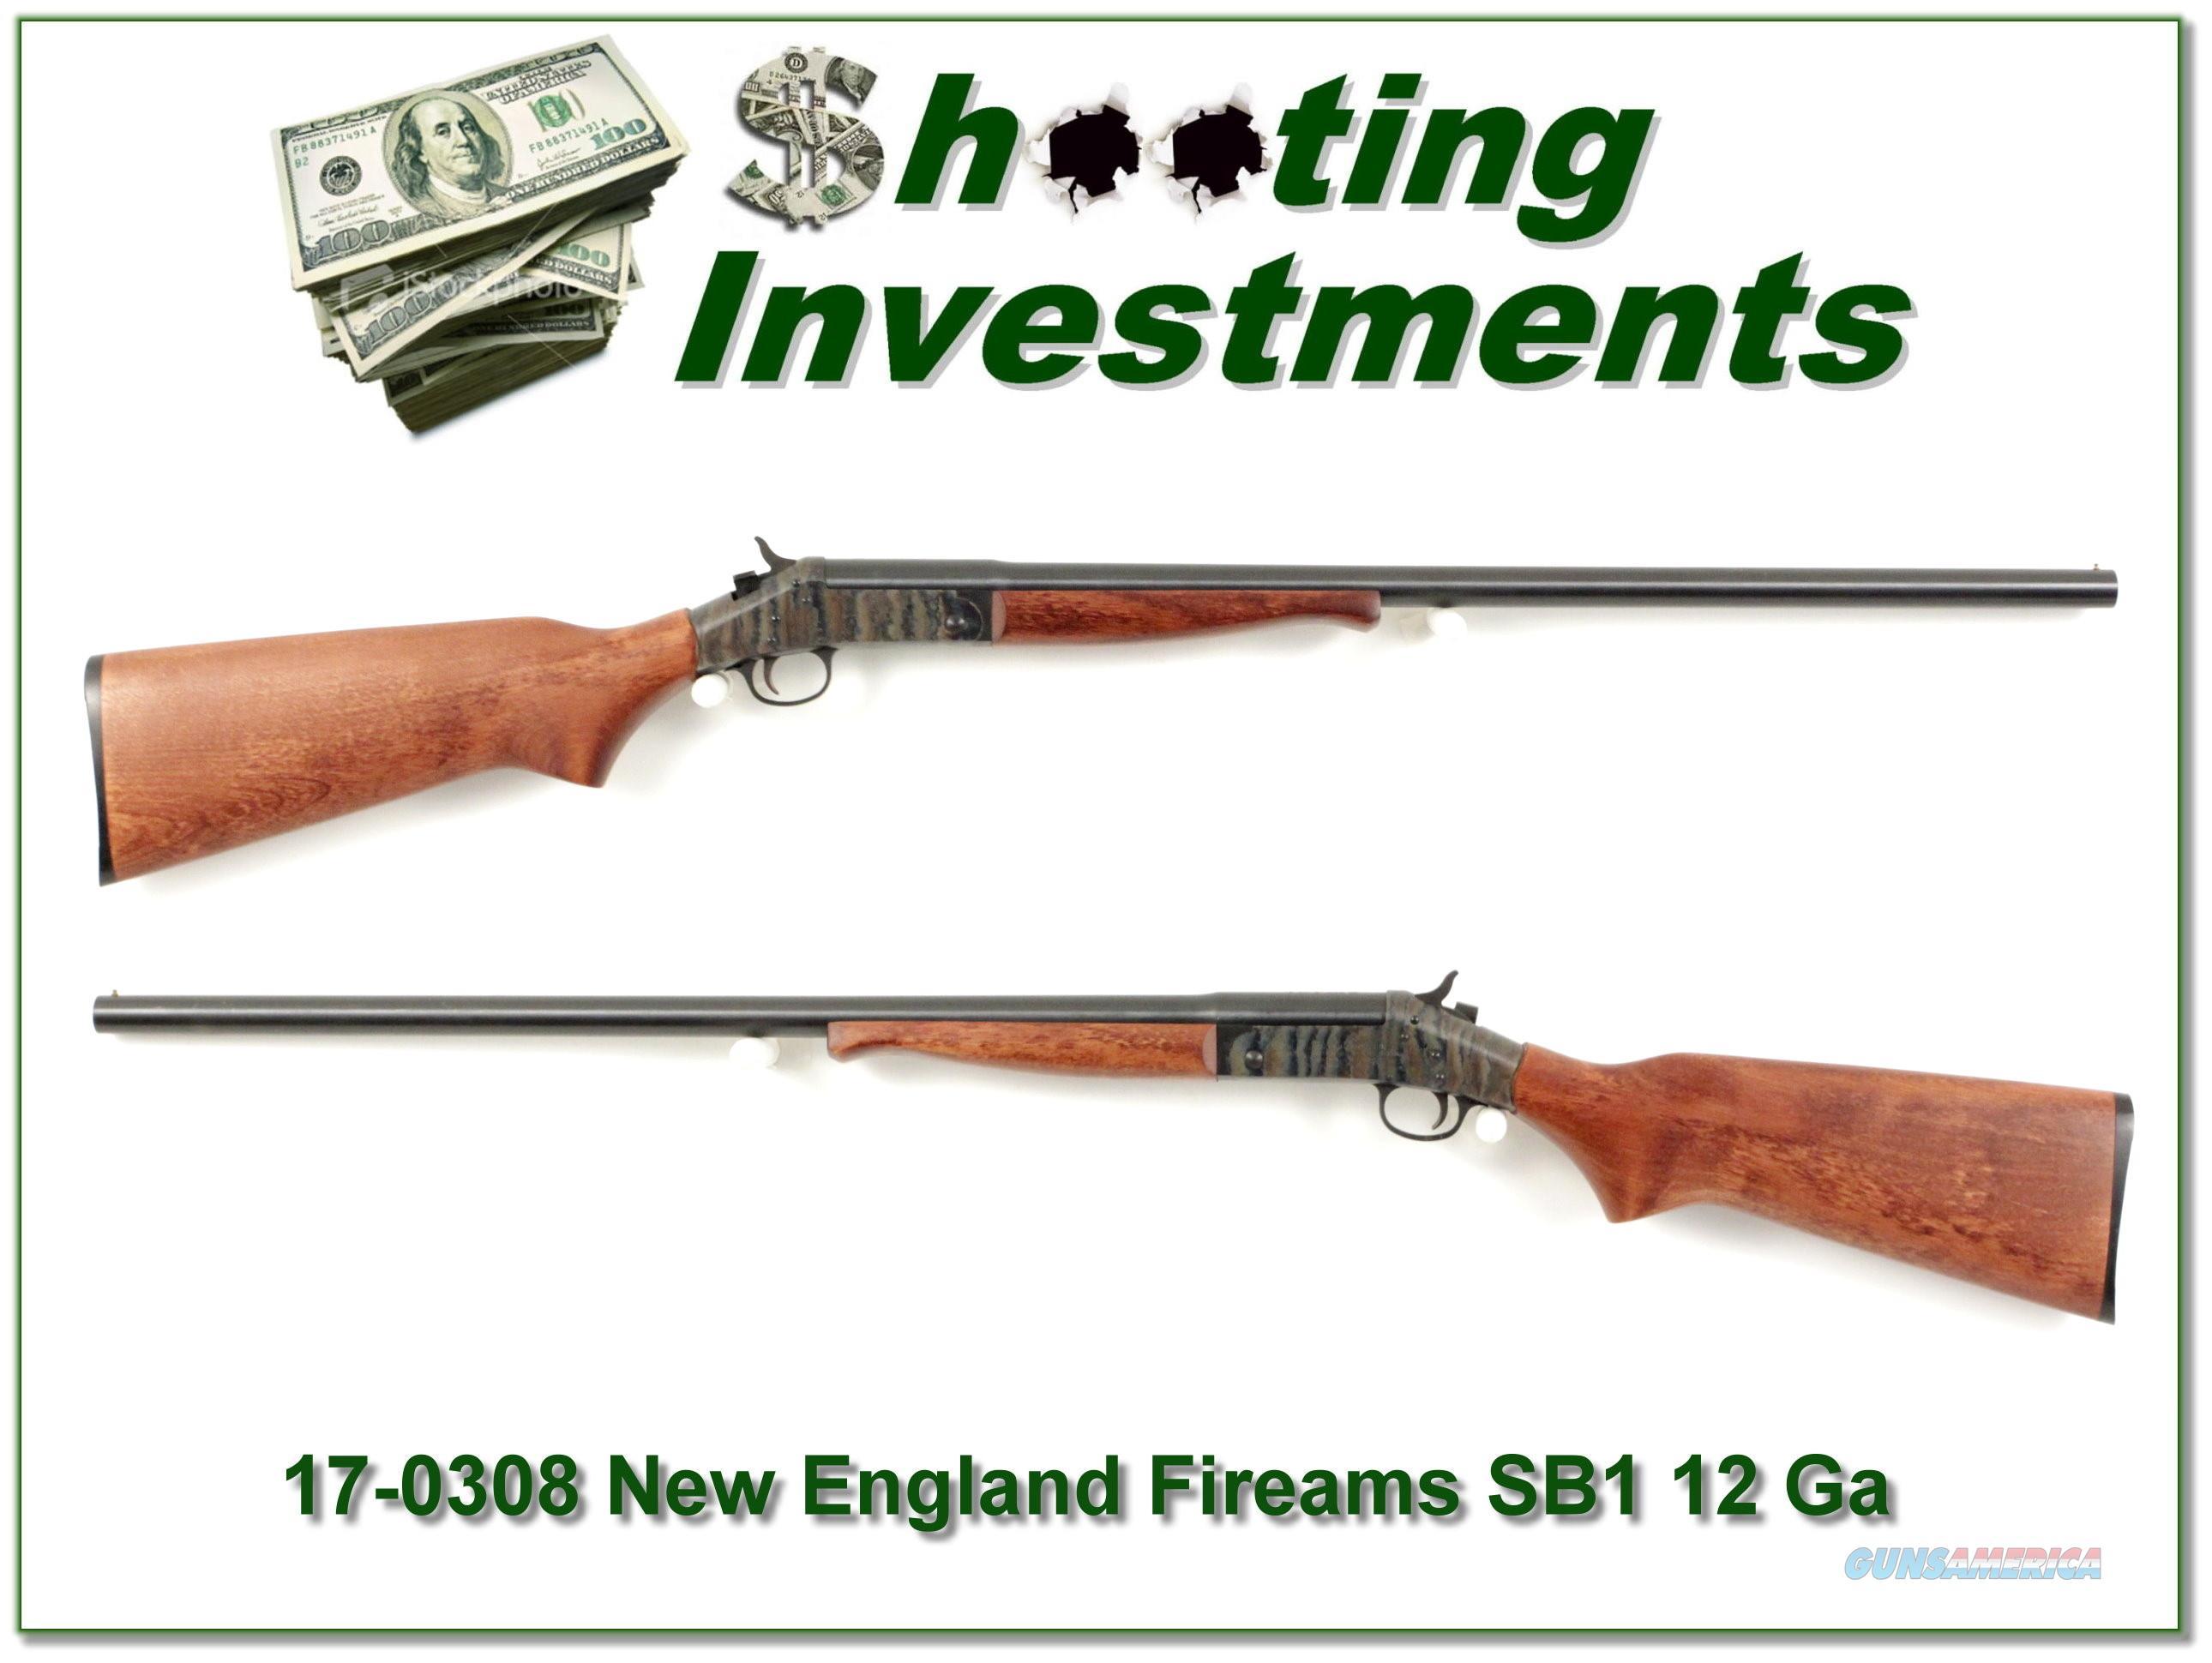 New England Firearms Partner SB1 12 Ga 3in 28in Mod  Guns > Shotguns > New England Firearms (NEF) Shotguns